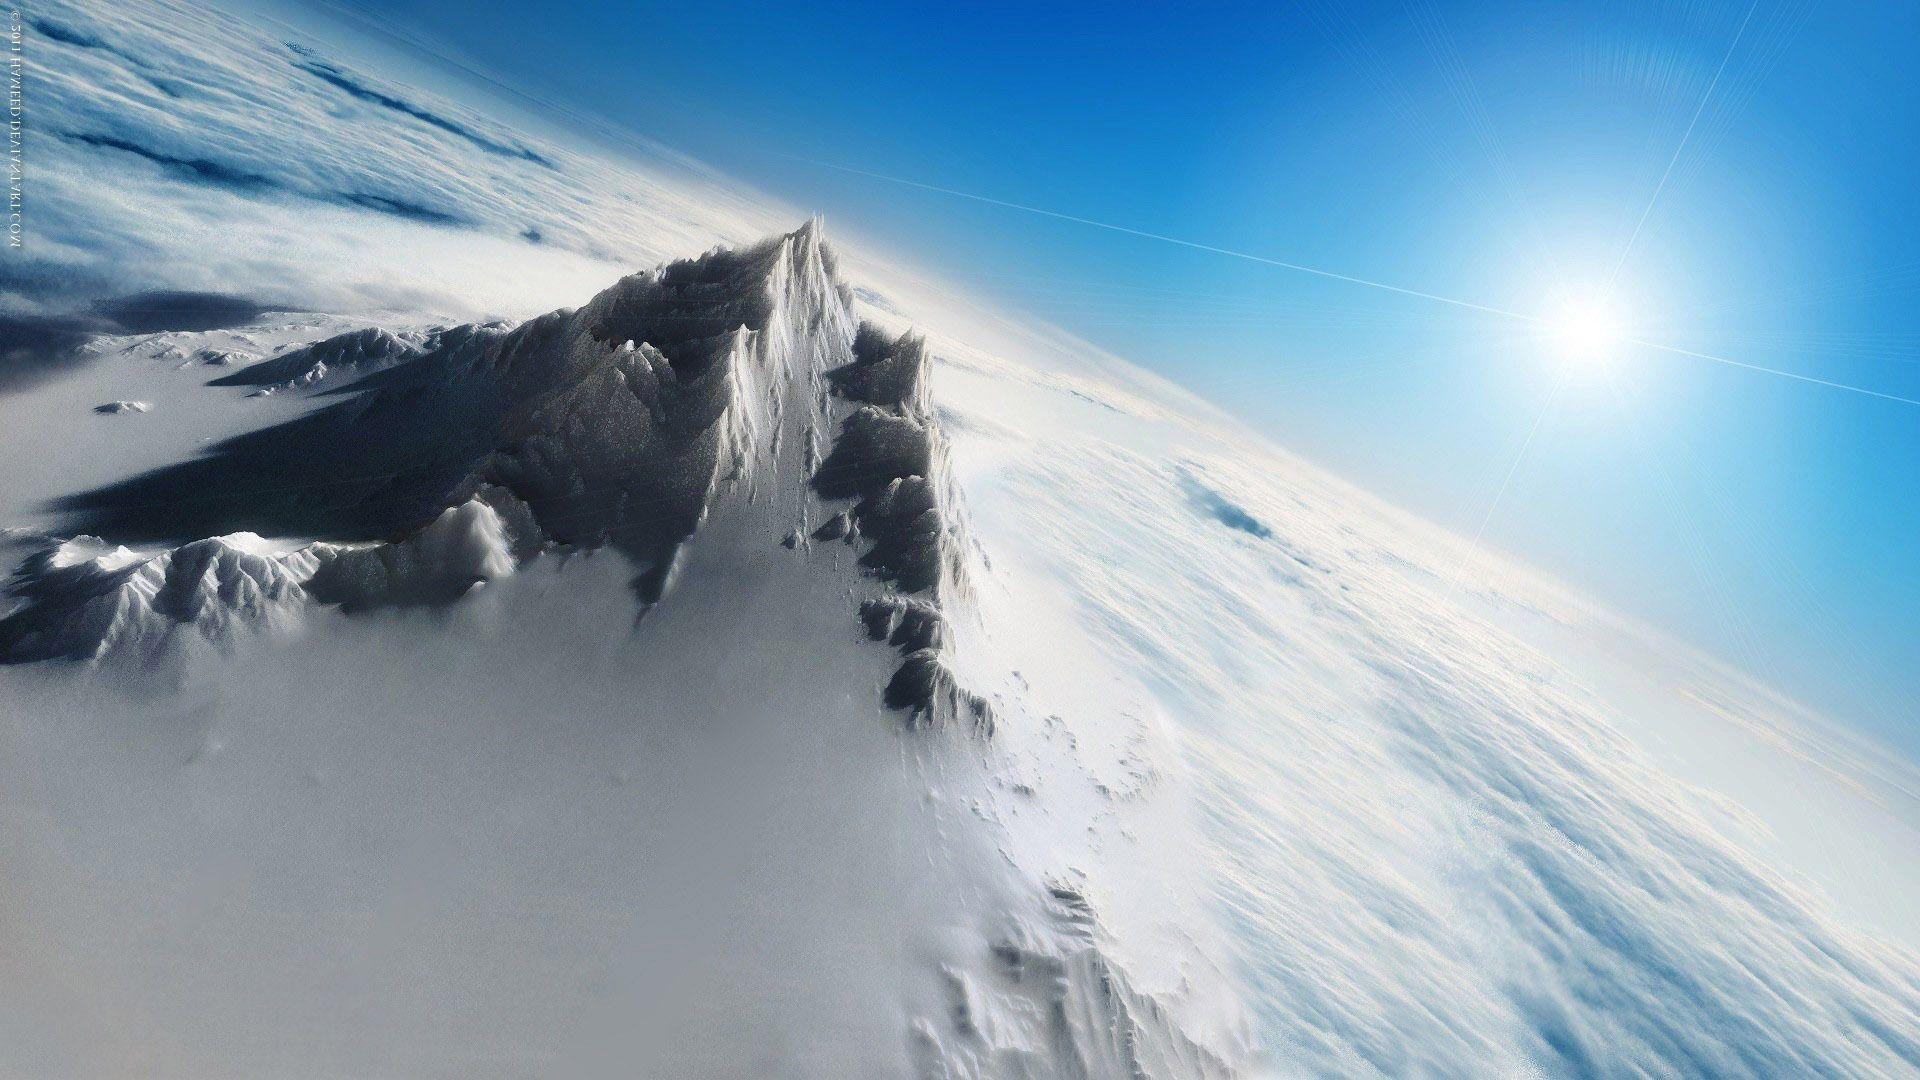 Amazing Wallpaper Mountain Fog - f1b2364d0ca196f44b02f84ccf2565d9  You Should Have_833538.jpg